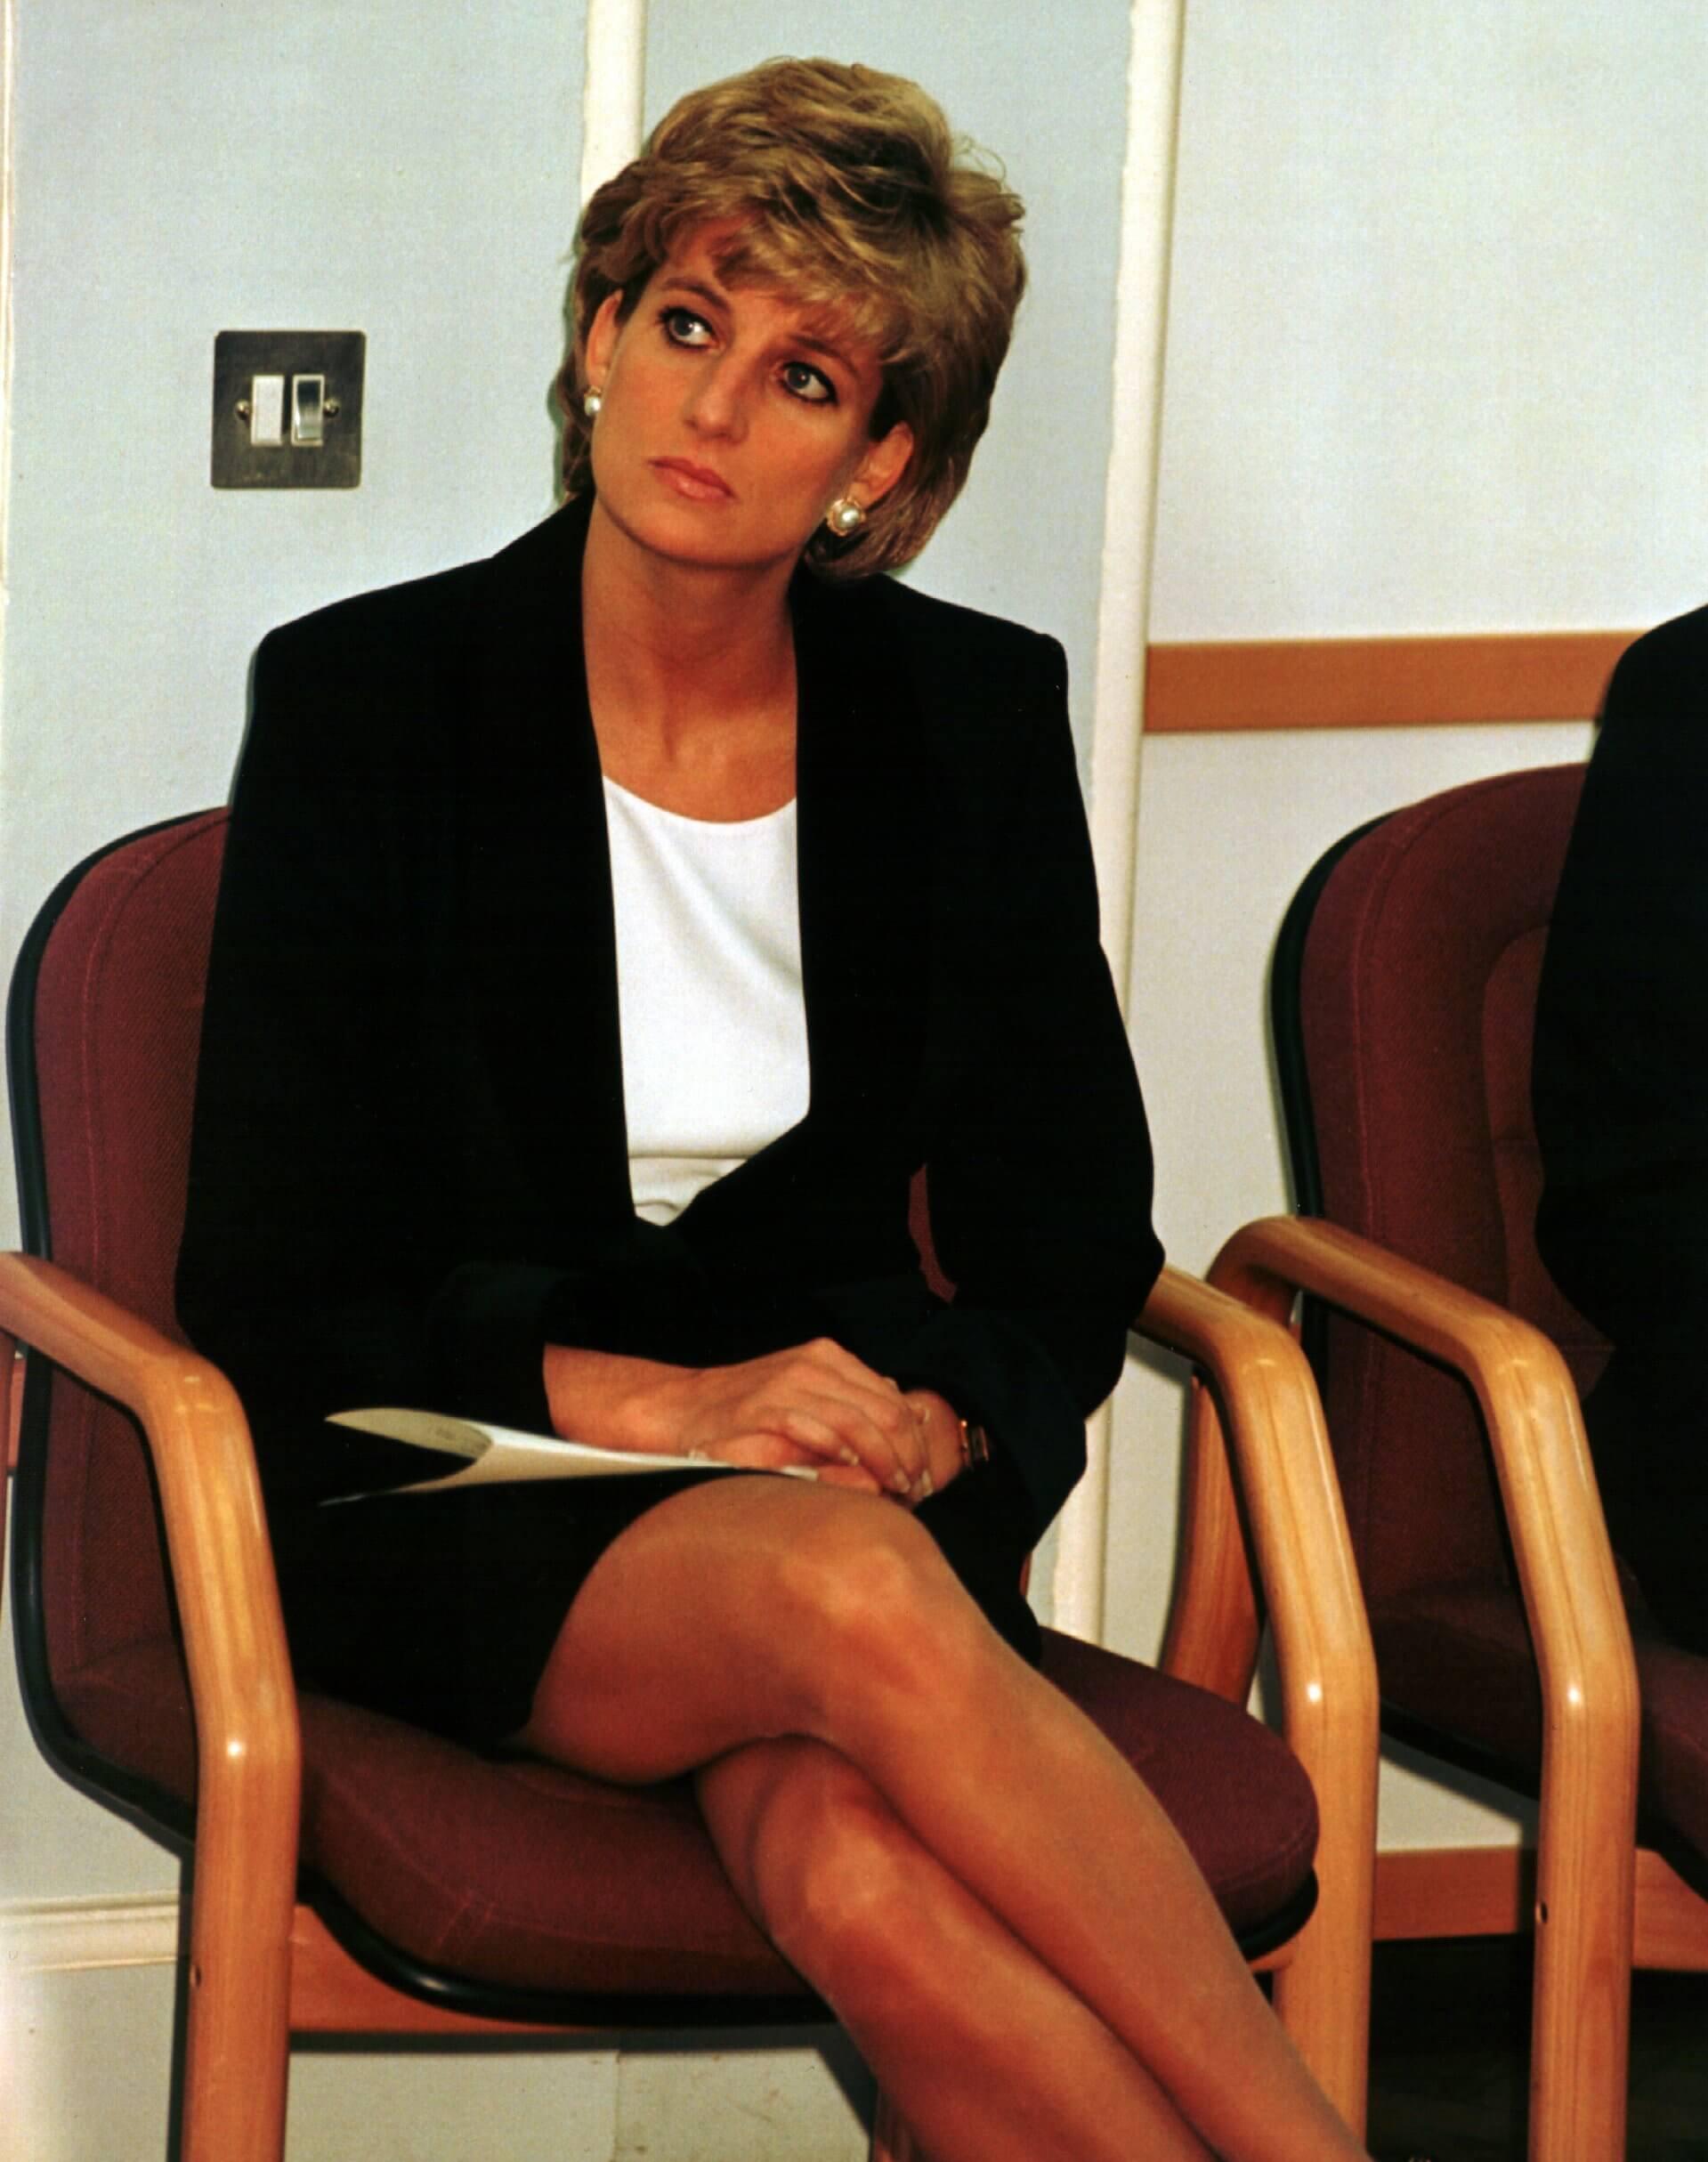 Prinzessin Diana litt an Bulimie